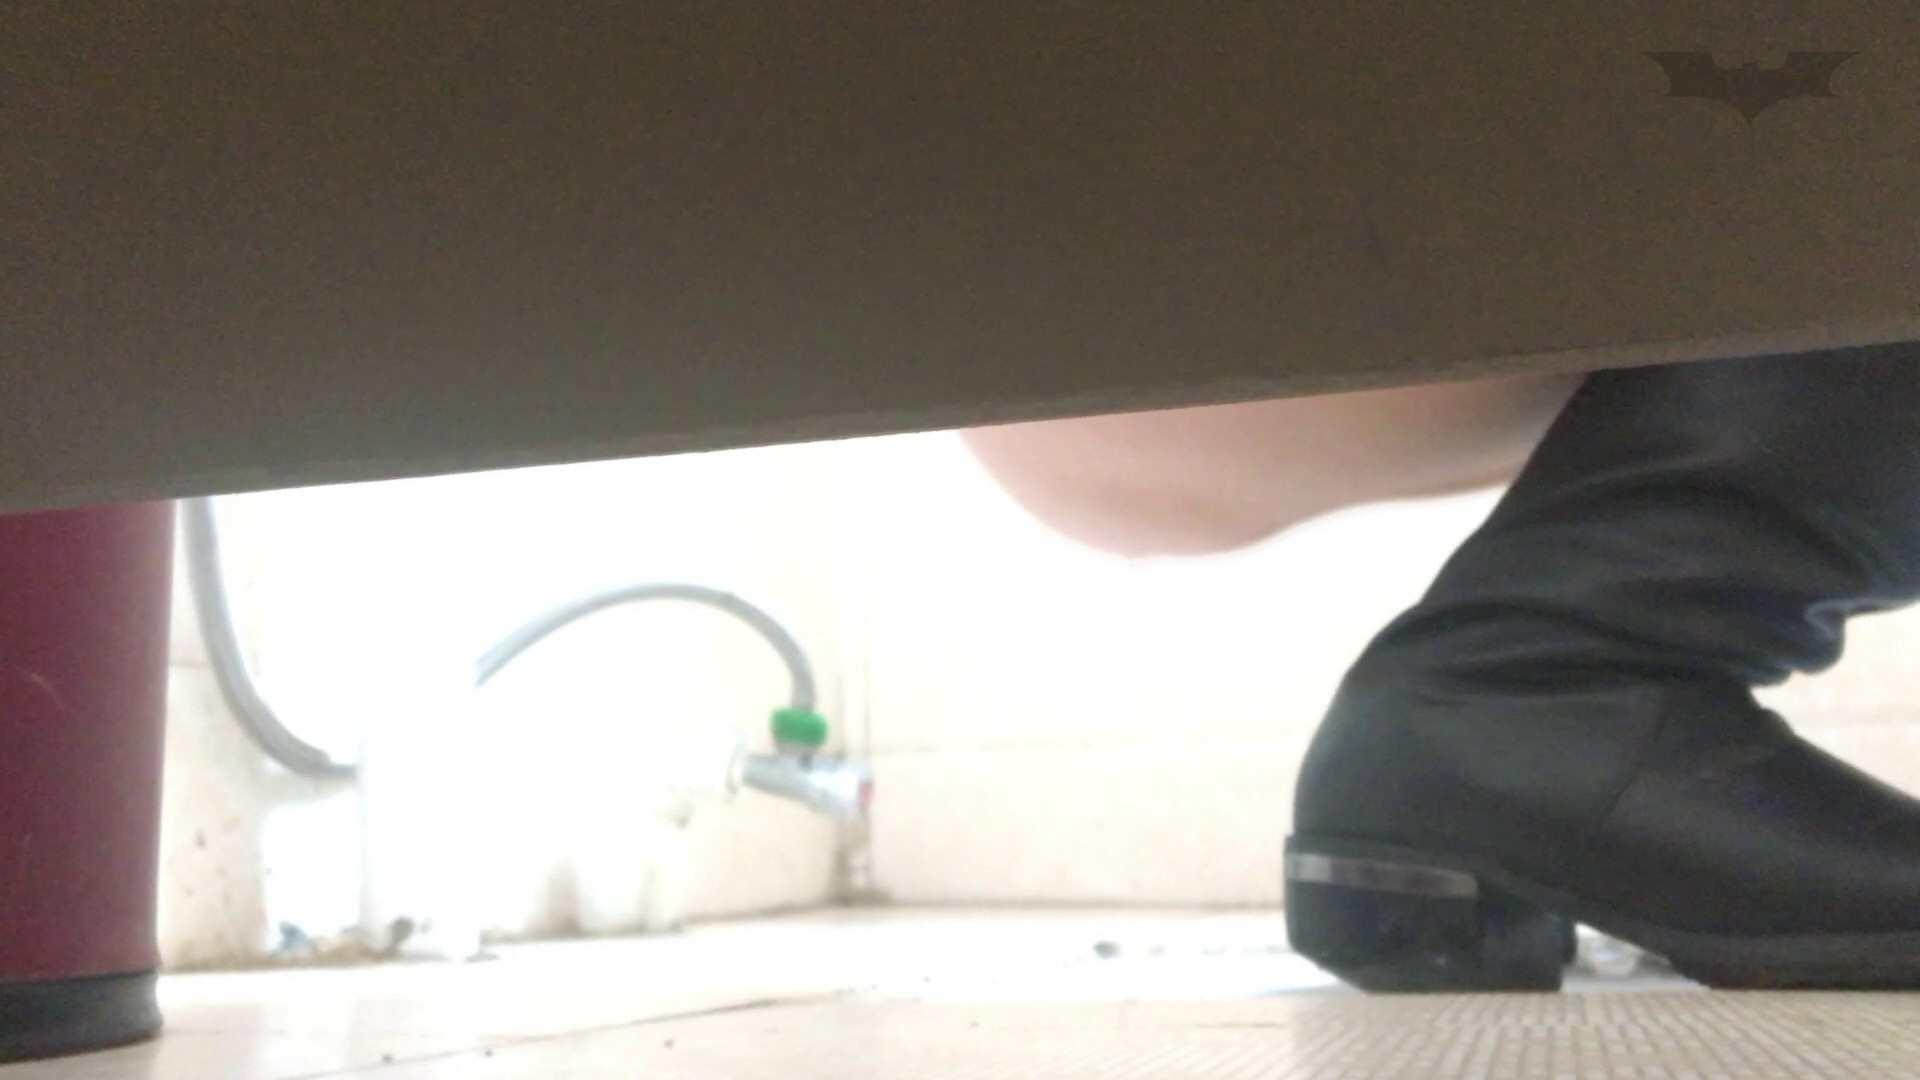 芸術大学ガチ潜入盗撮 JD盗撮 美女の洗面所の秘密 Vol.106 潜入 エロ画像 83画像 8